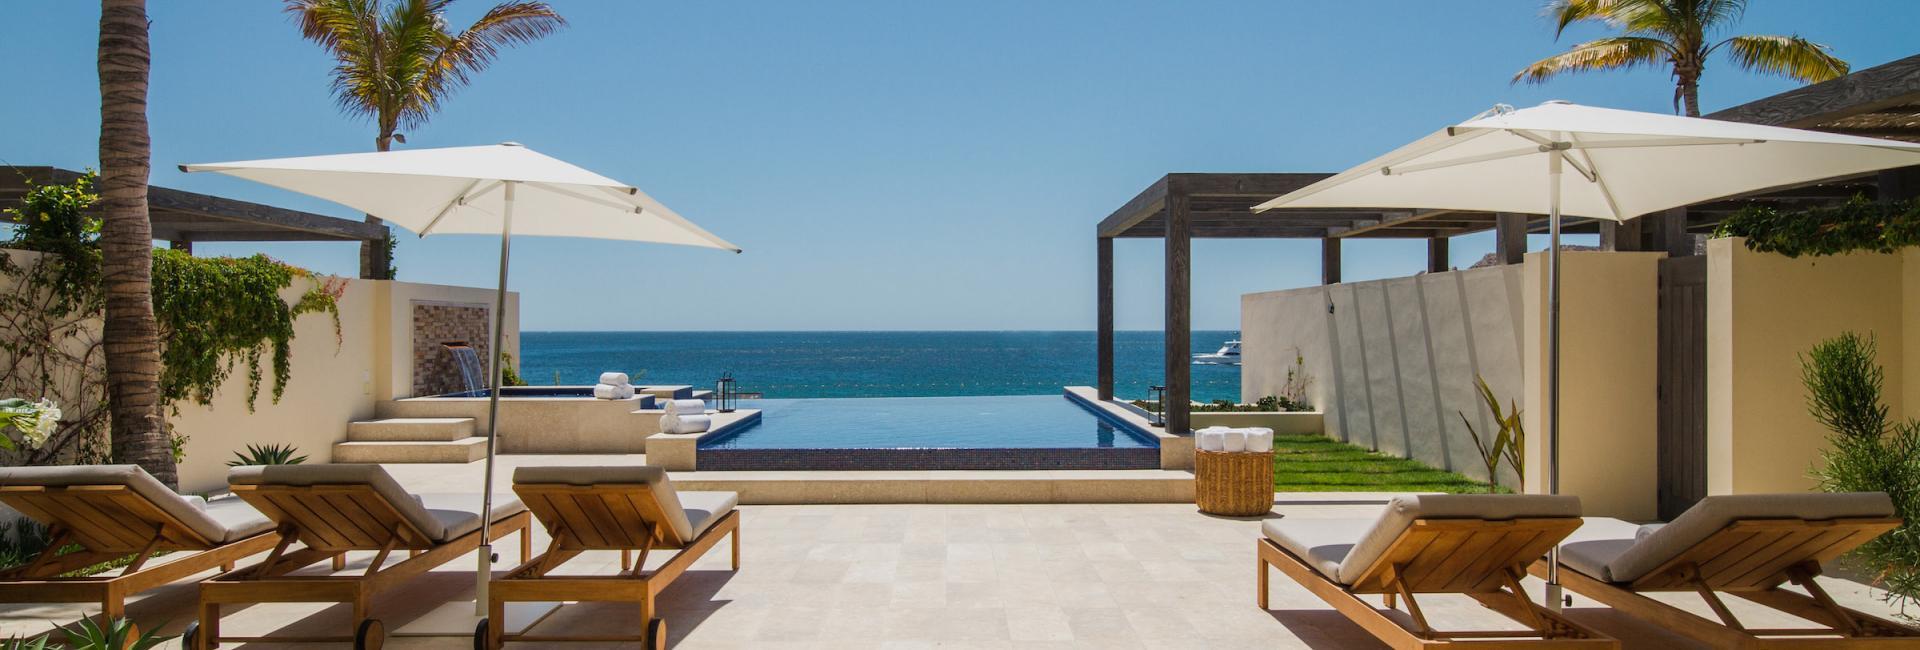 Five Bedroom Beachfront Villa Patio